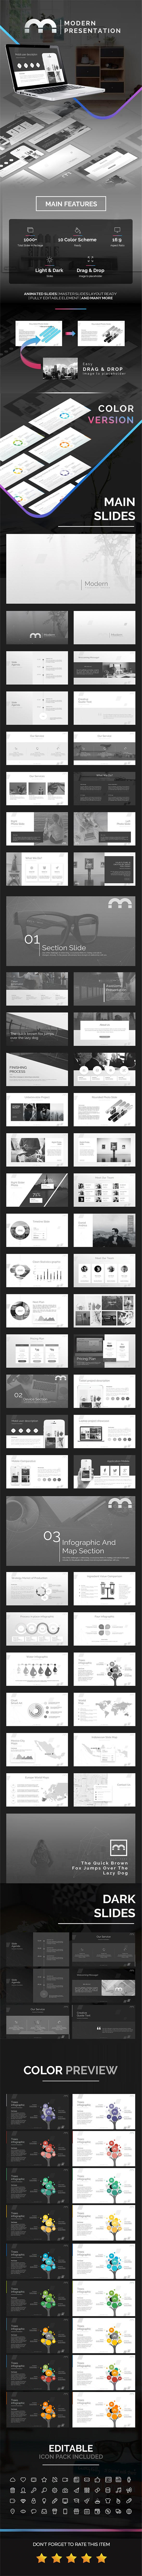 Modern Powerpoint Template - Business PowerPoint Templates